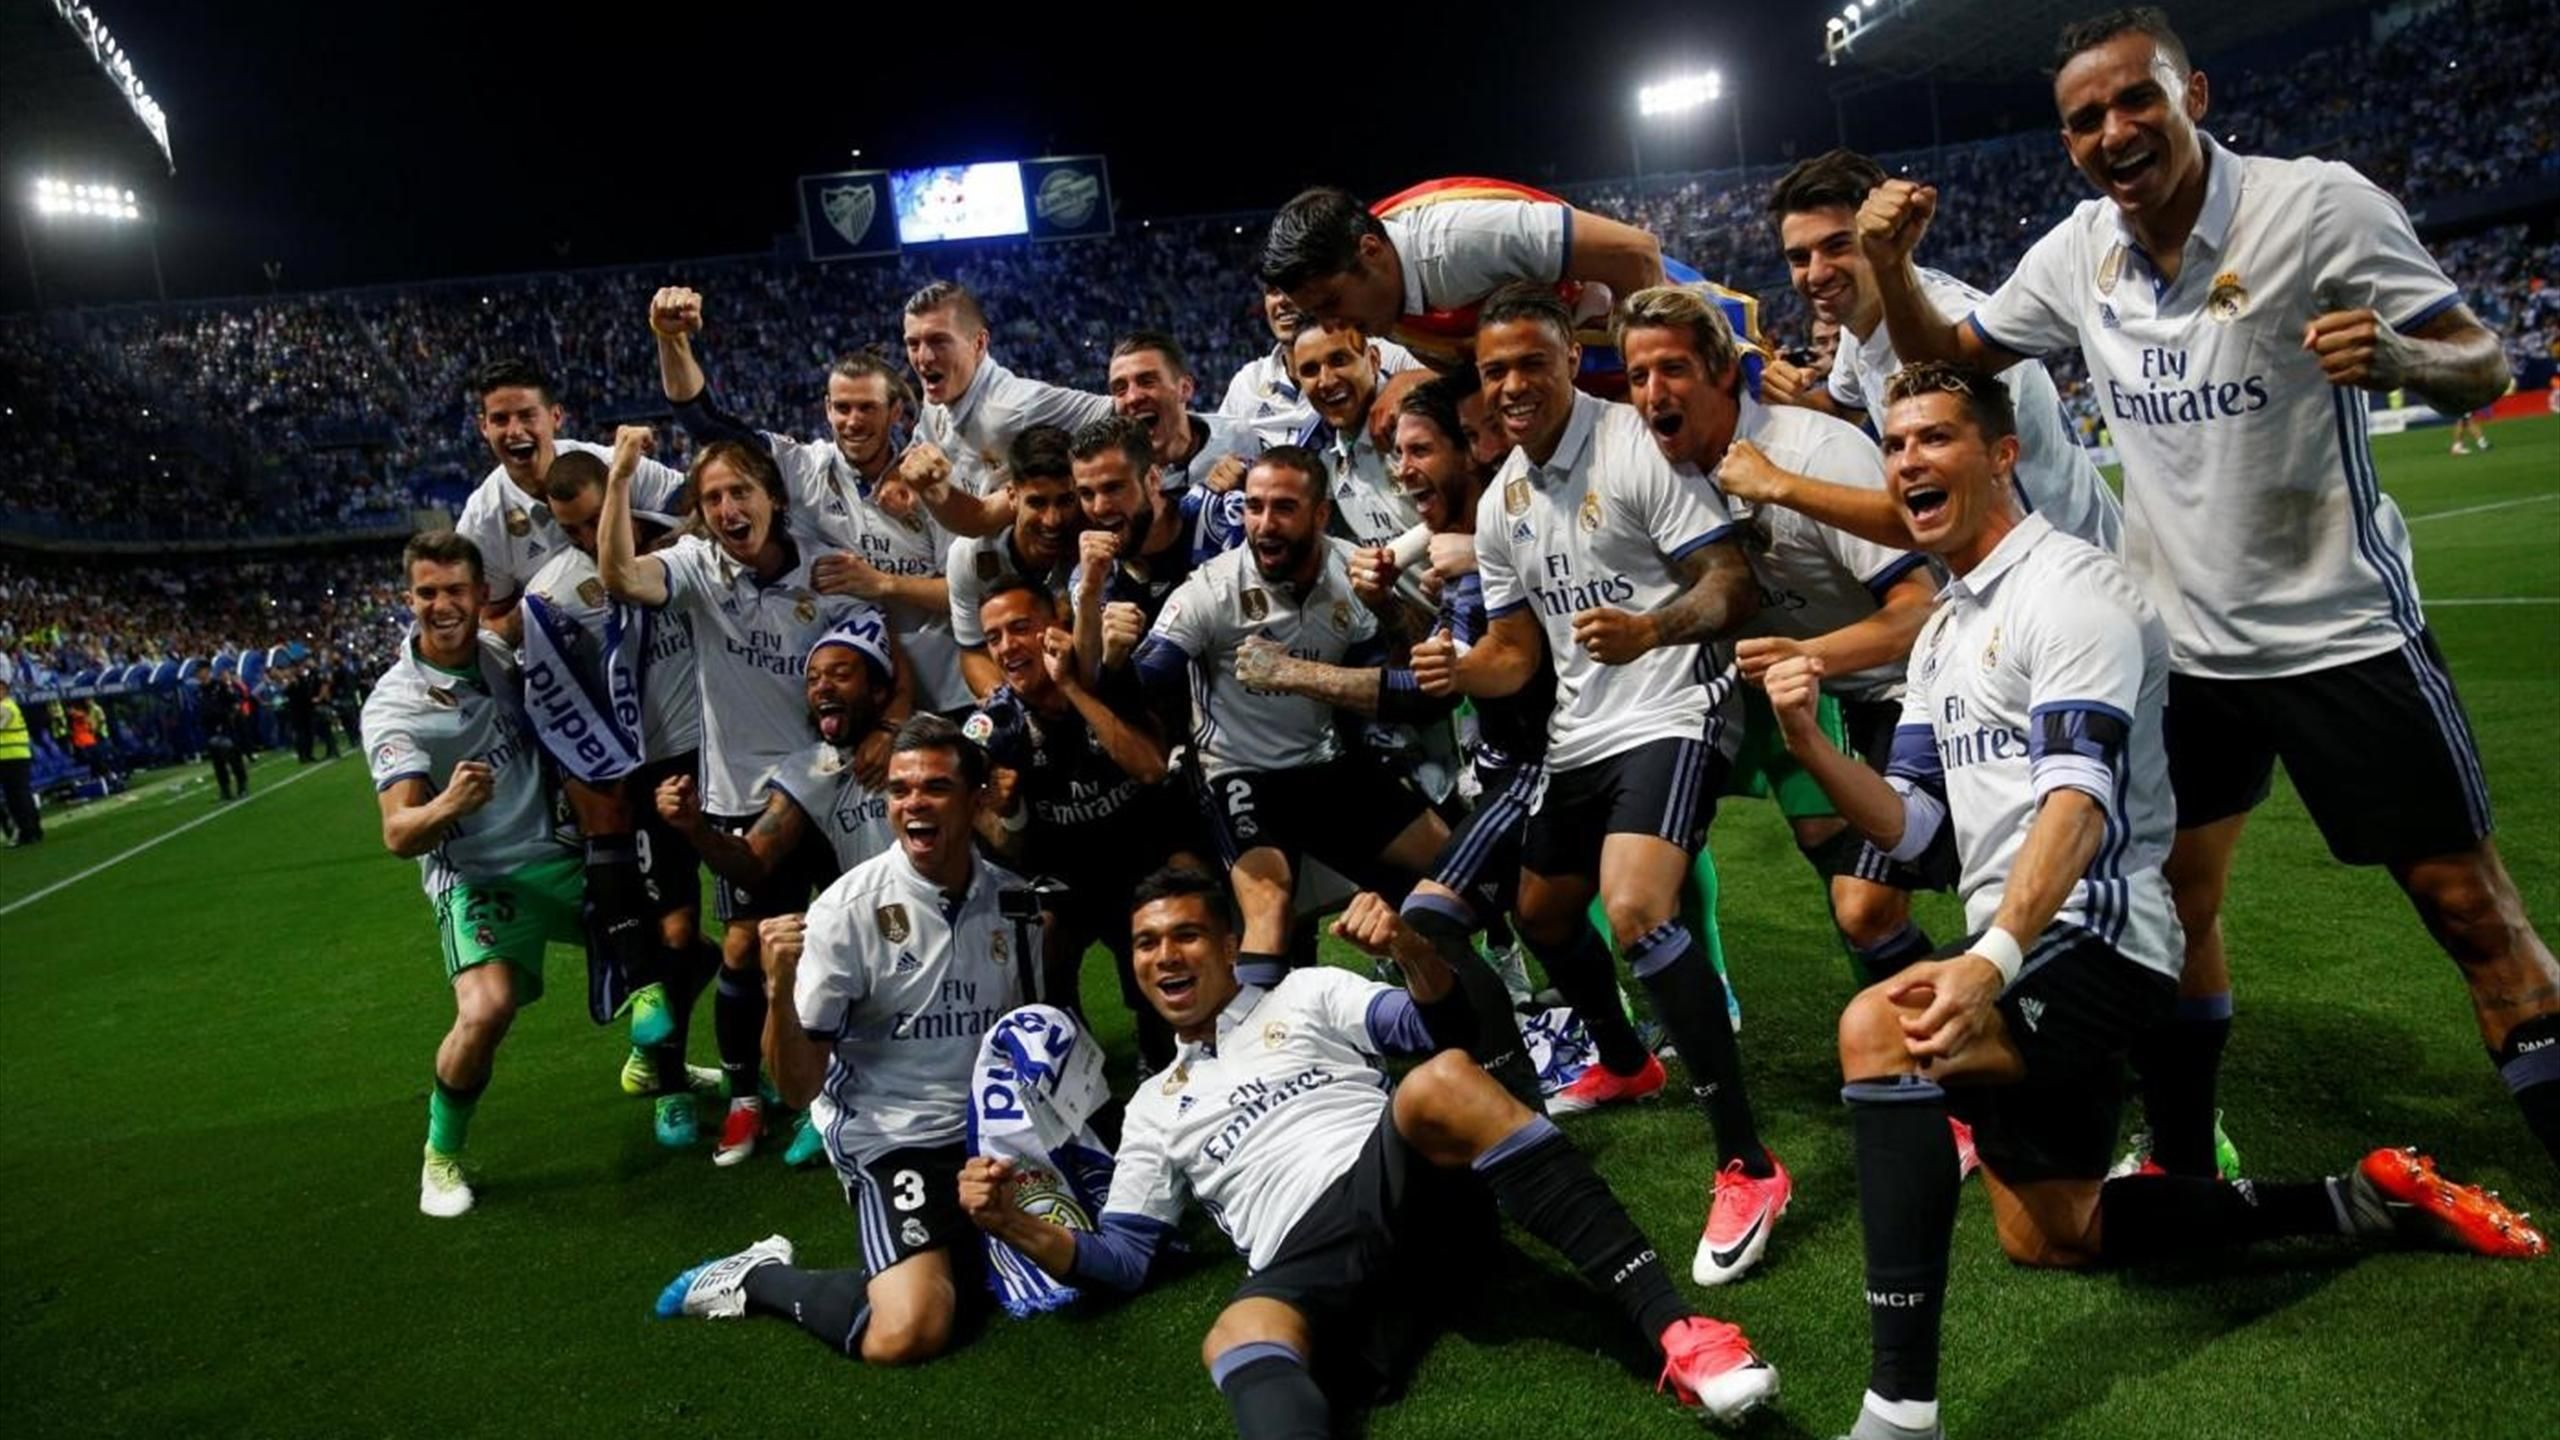 Испания футбол таблица сезон 2016 2017